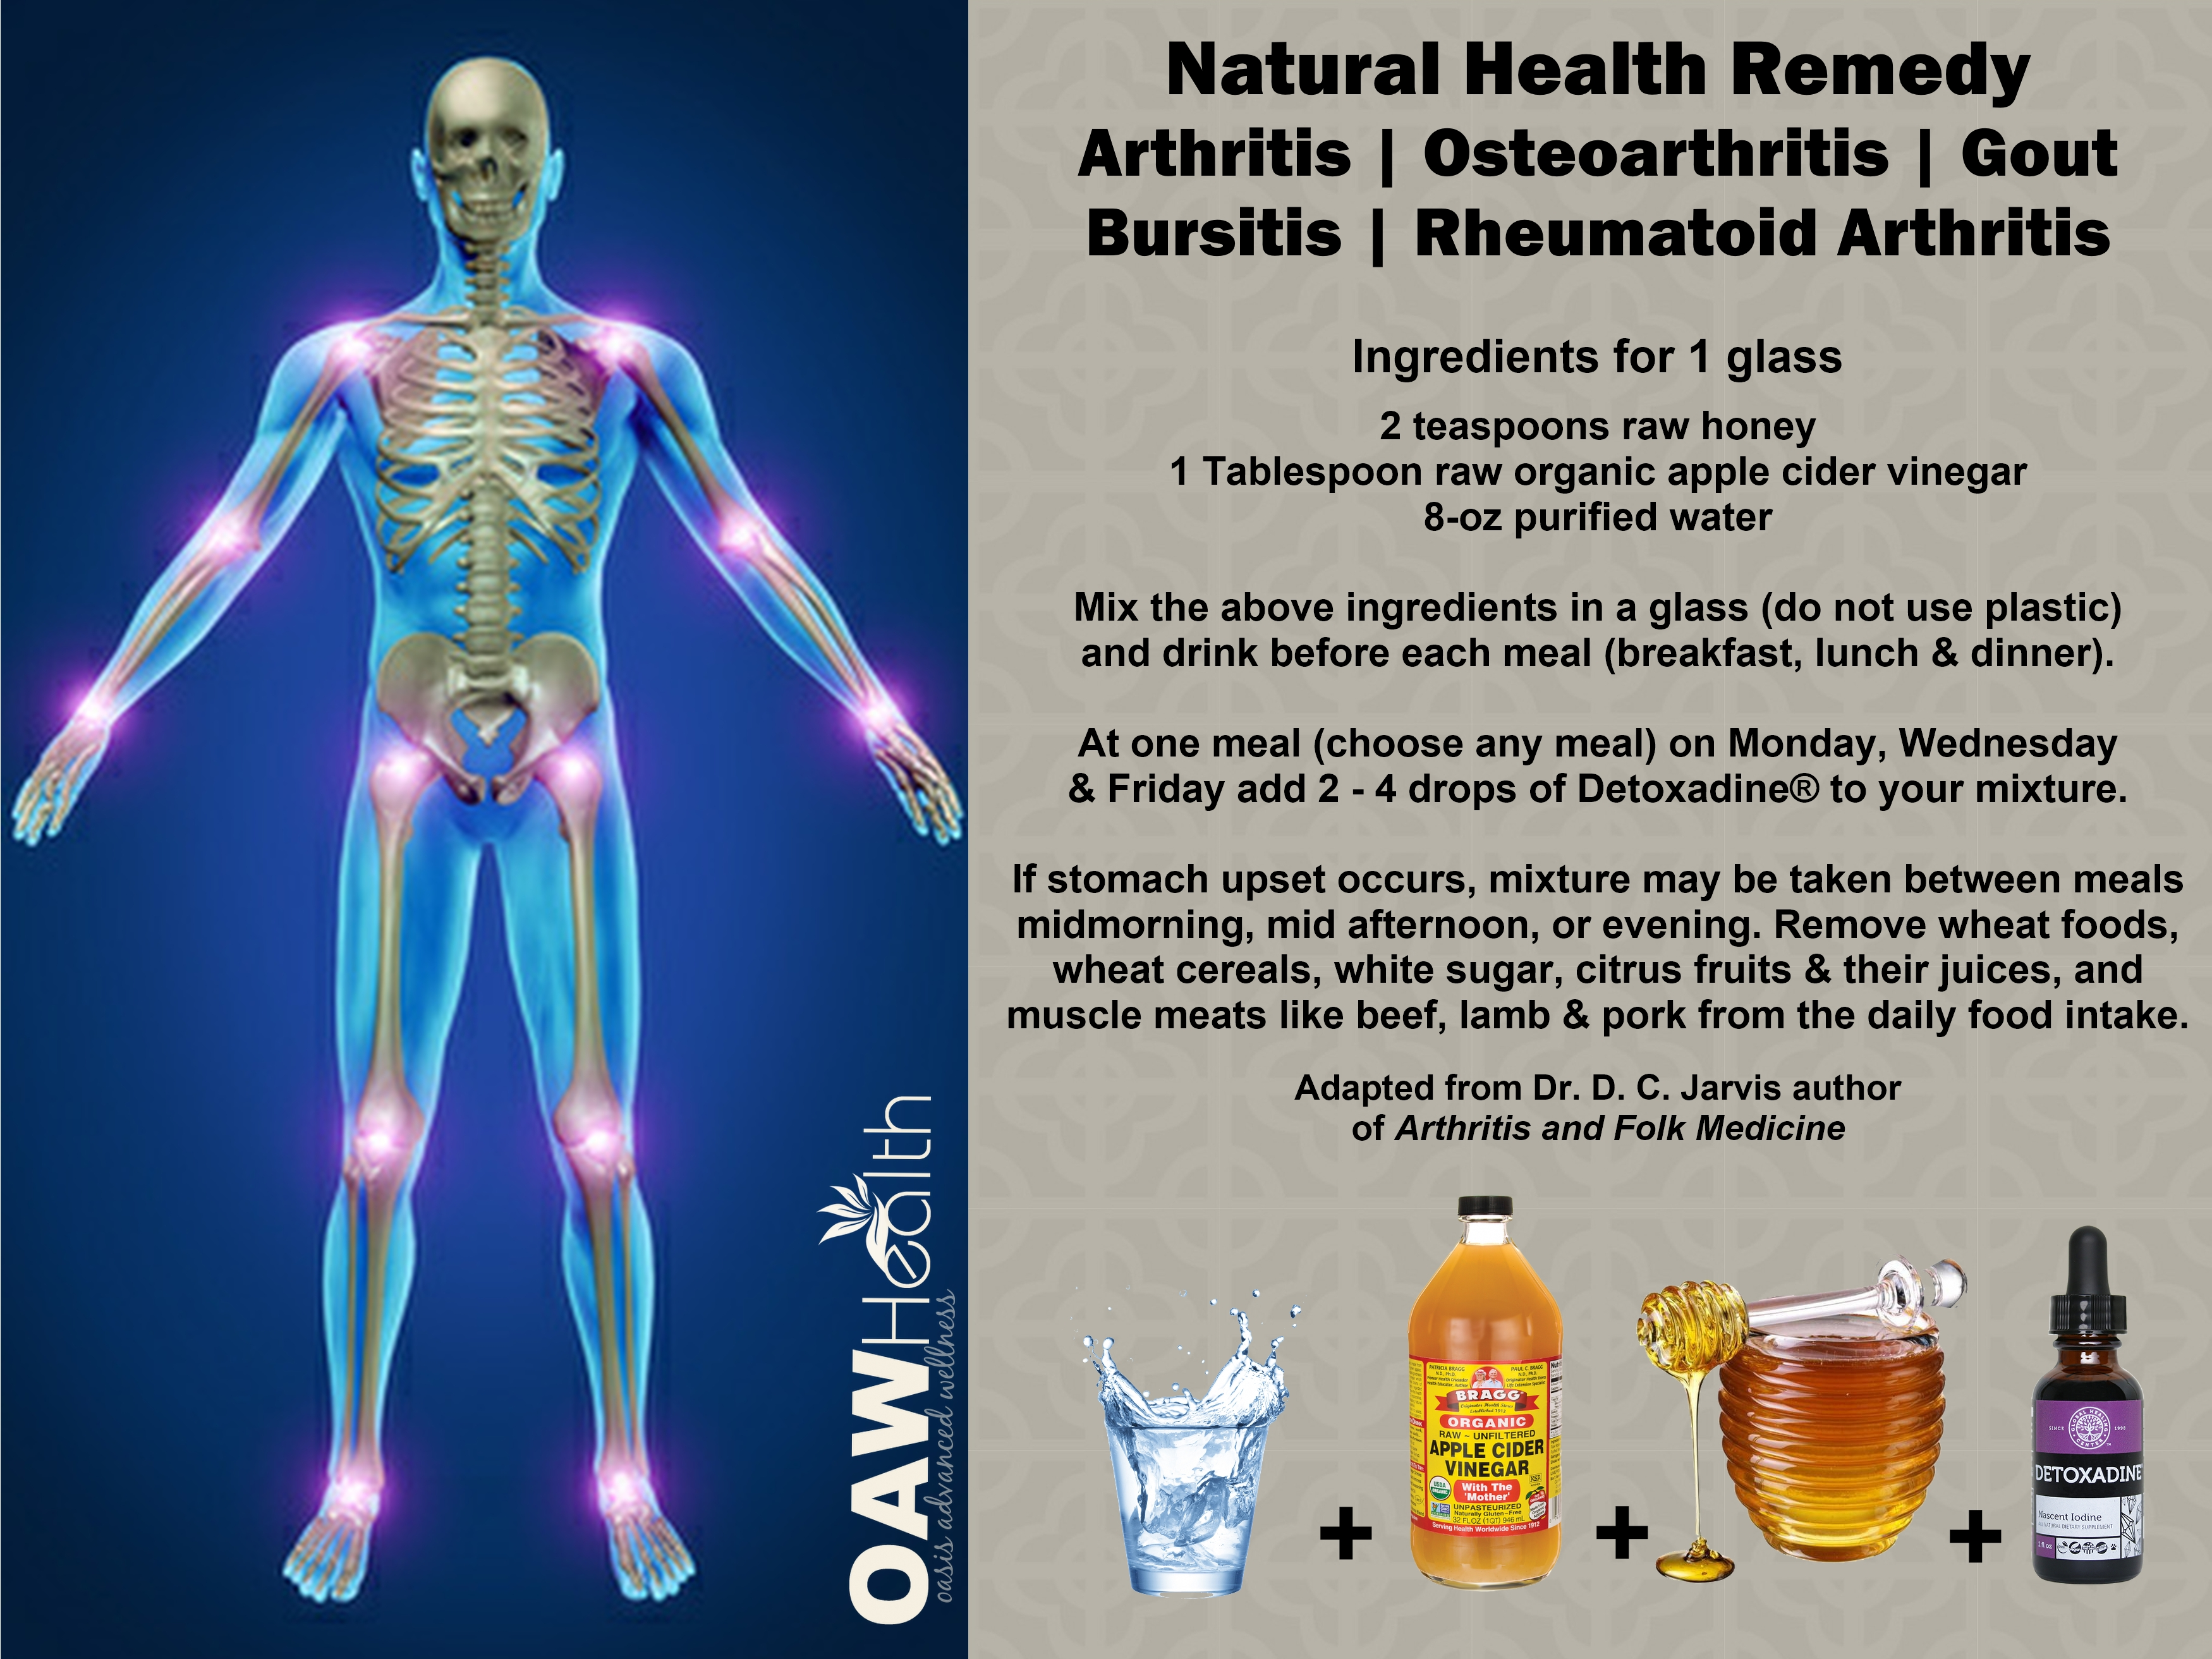 Natural Health Remedy for Arthritis